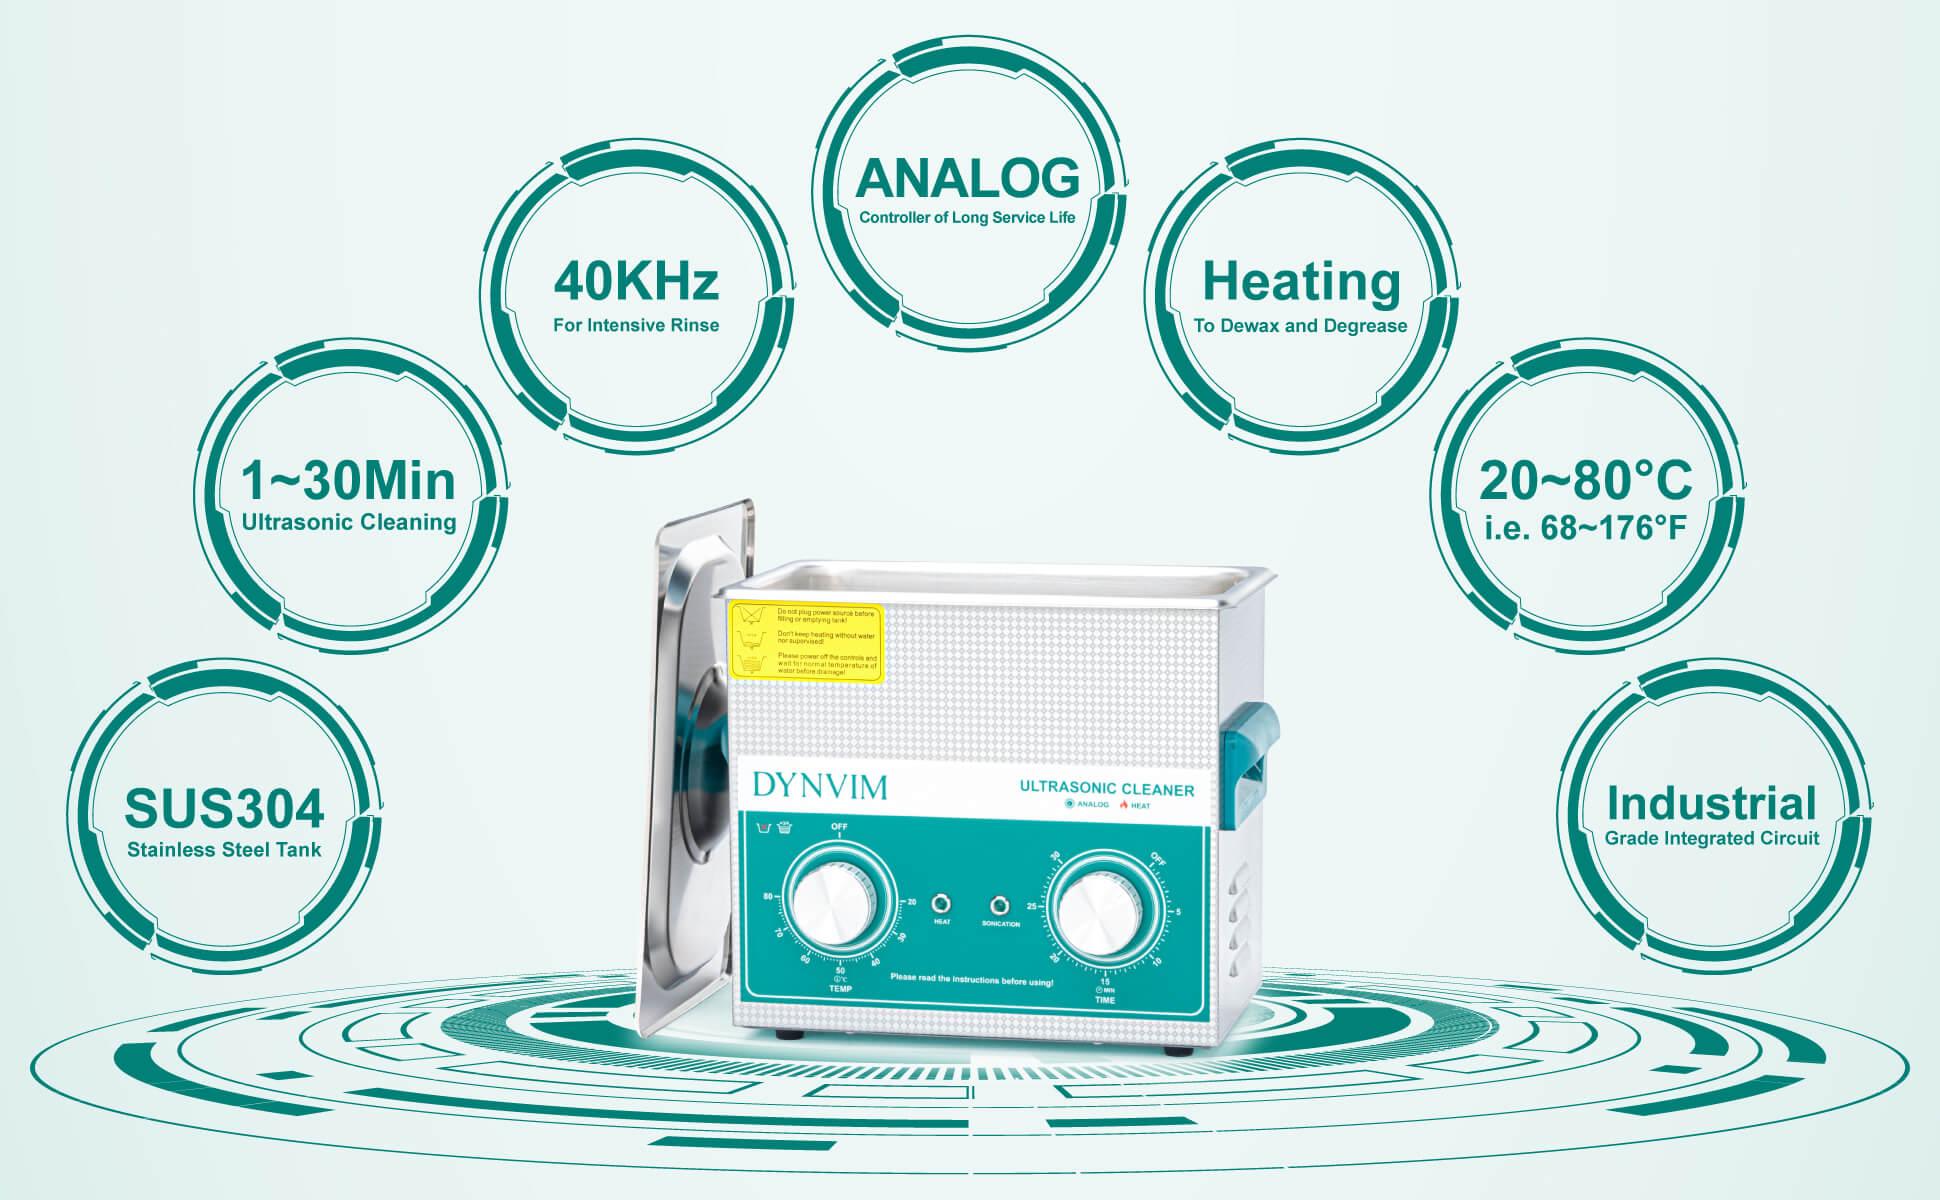 3L Analog Ultrasonic Jewelry Cleaner